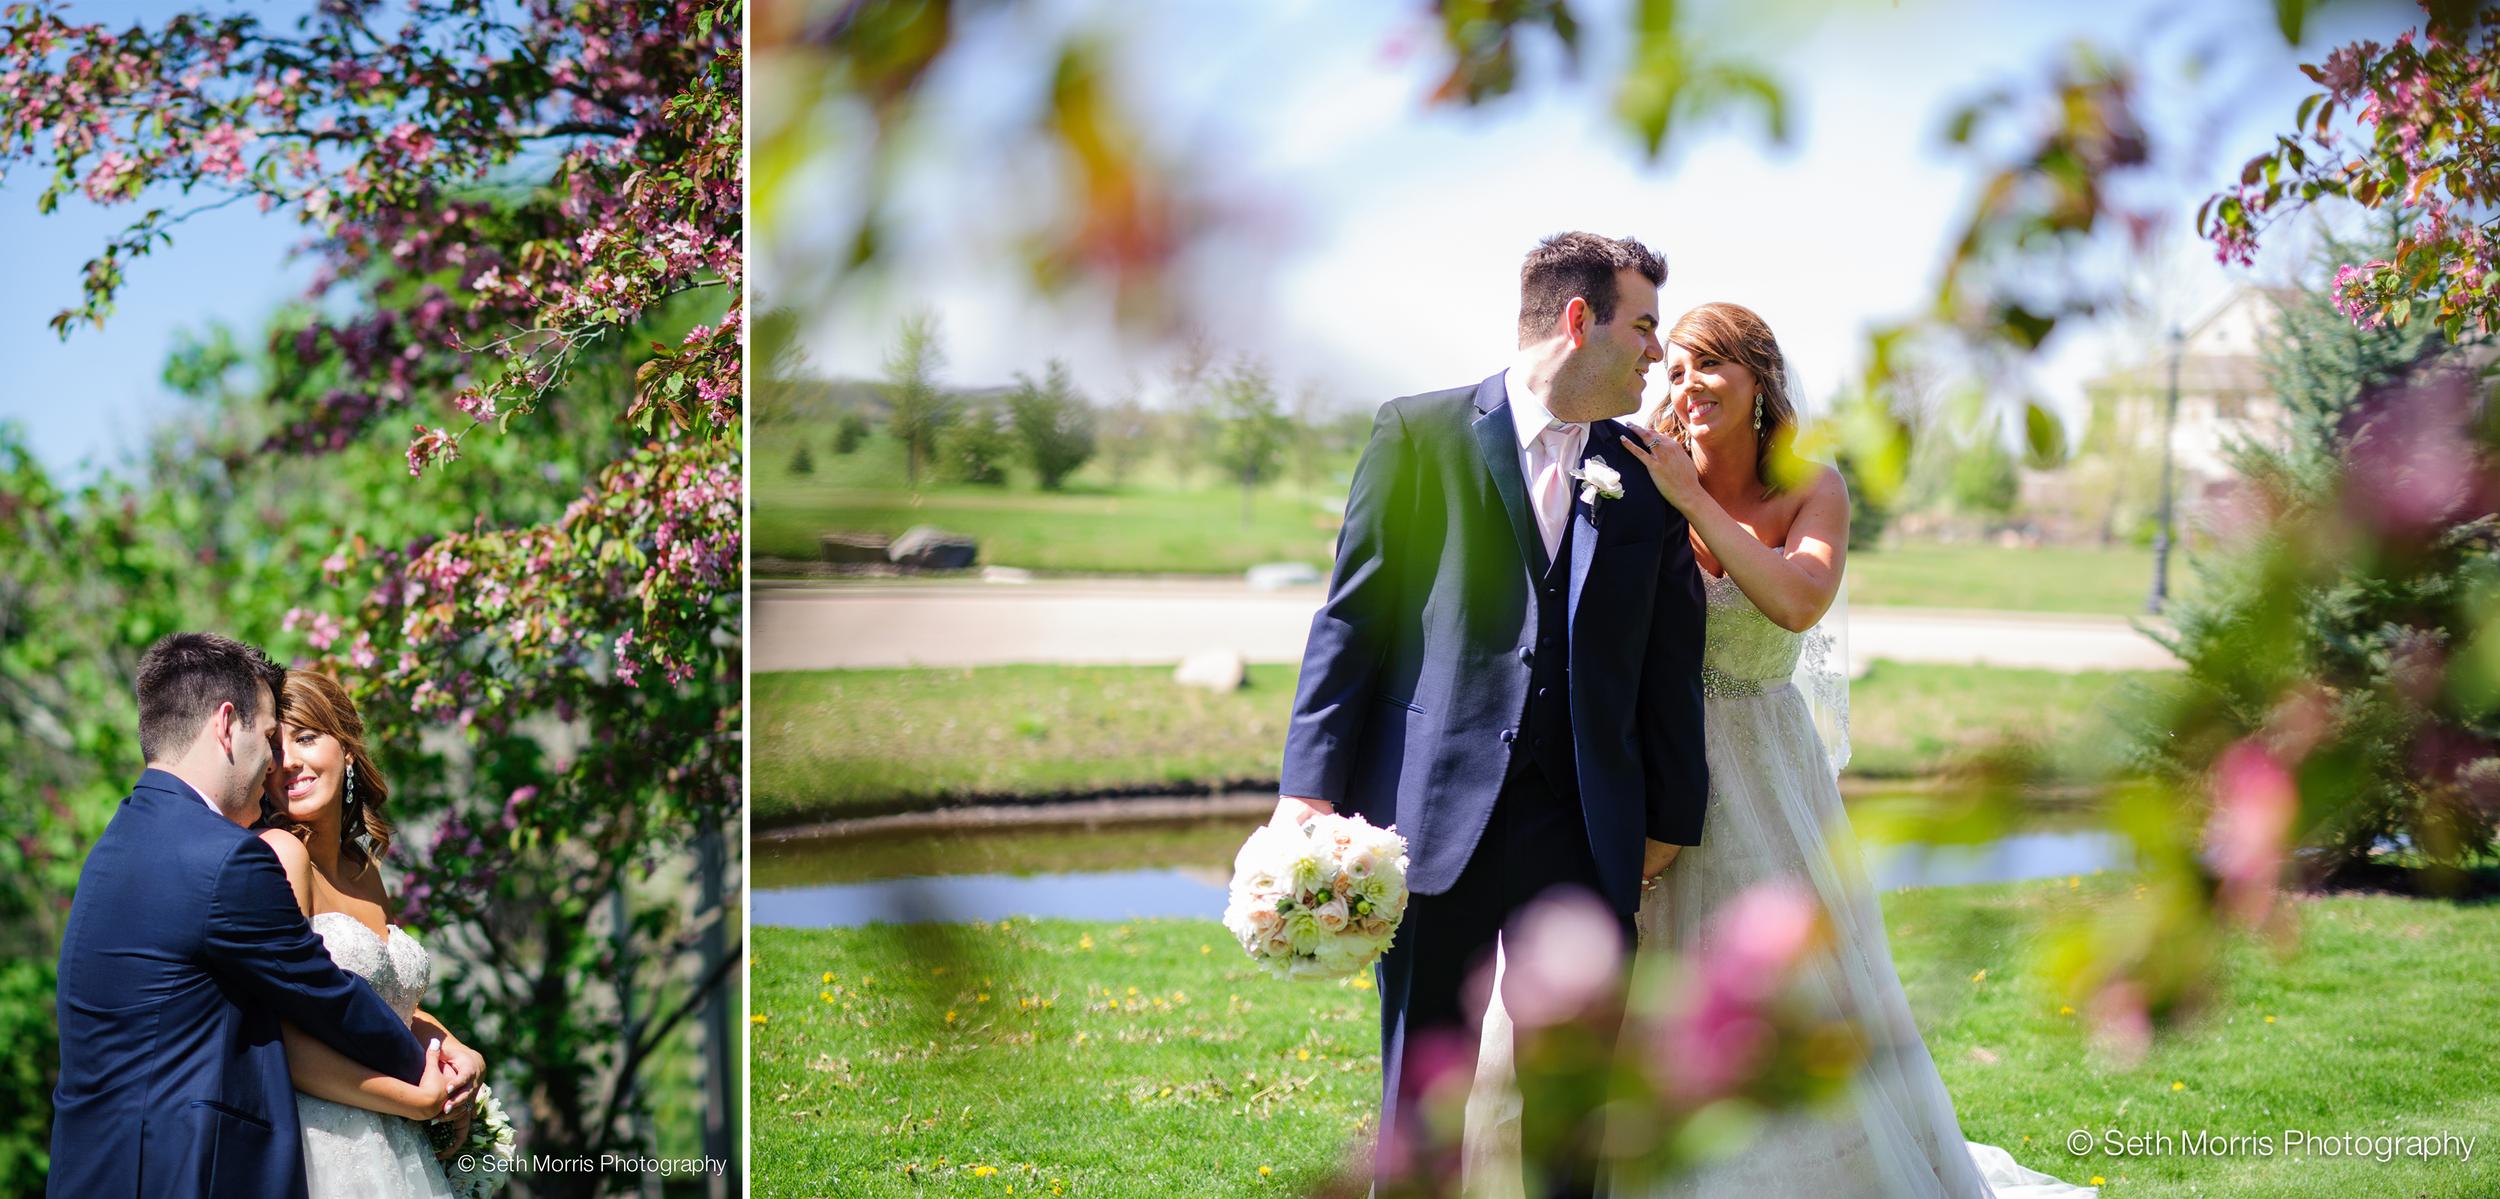 metamora-fields-wedding-photographer-peoria-116.jpg